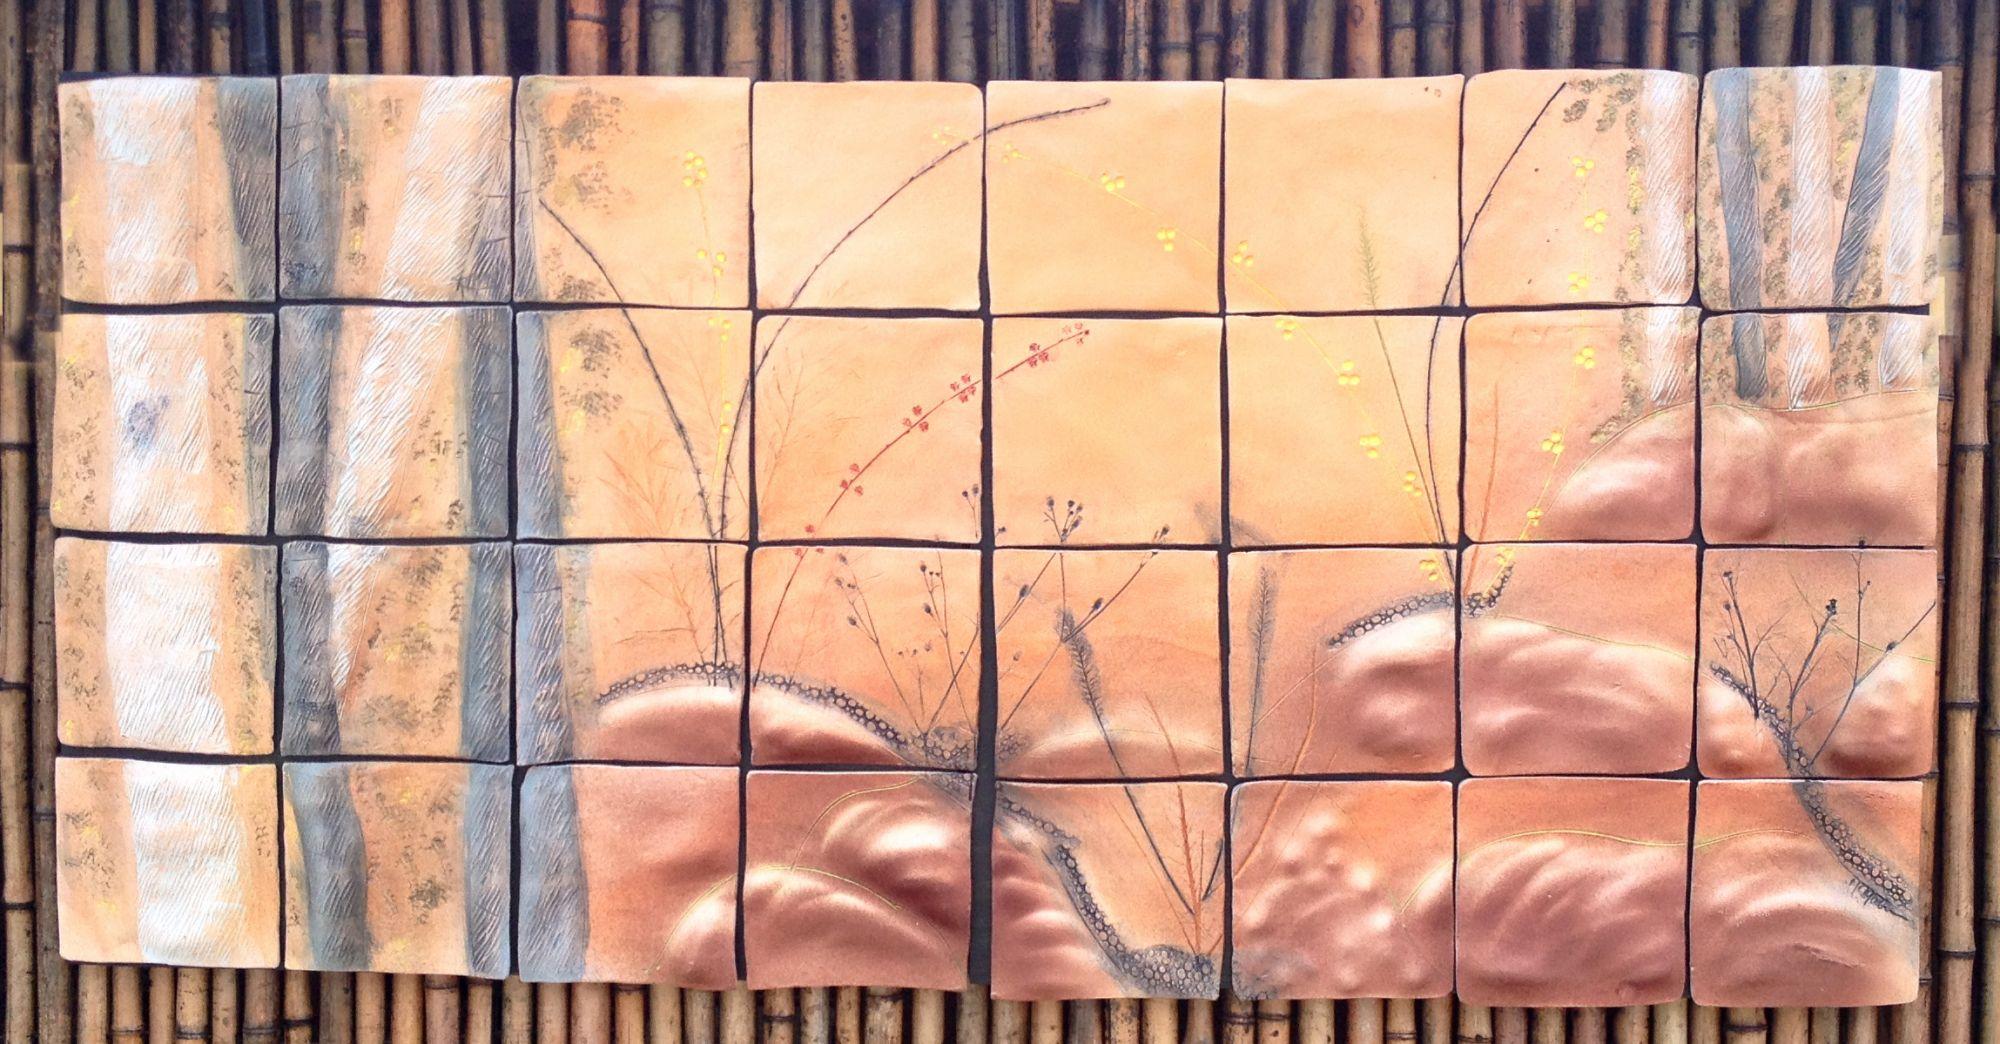 Quaking Aspen Ceramic Tile Wall Art Original Ceramic Art Piece By